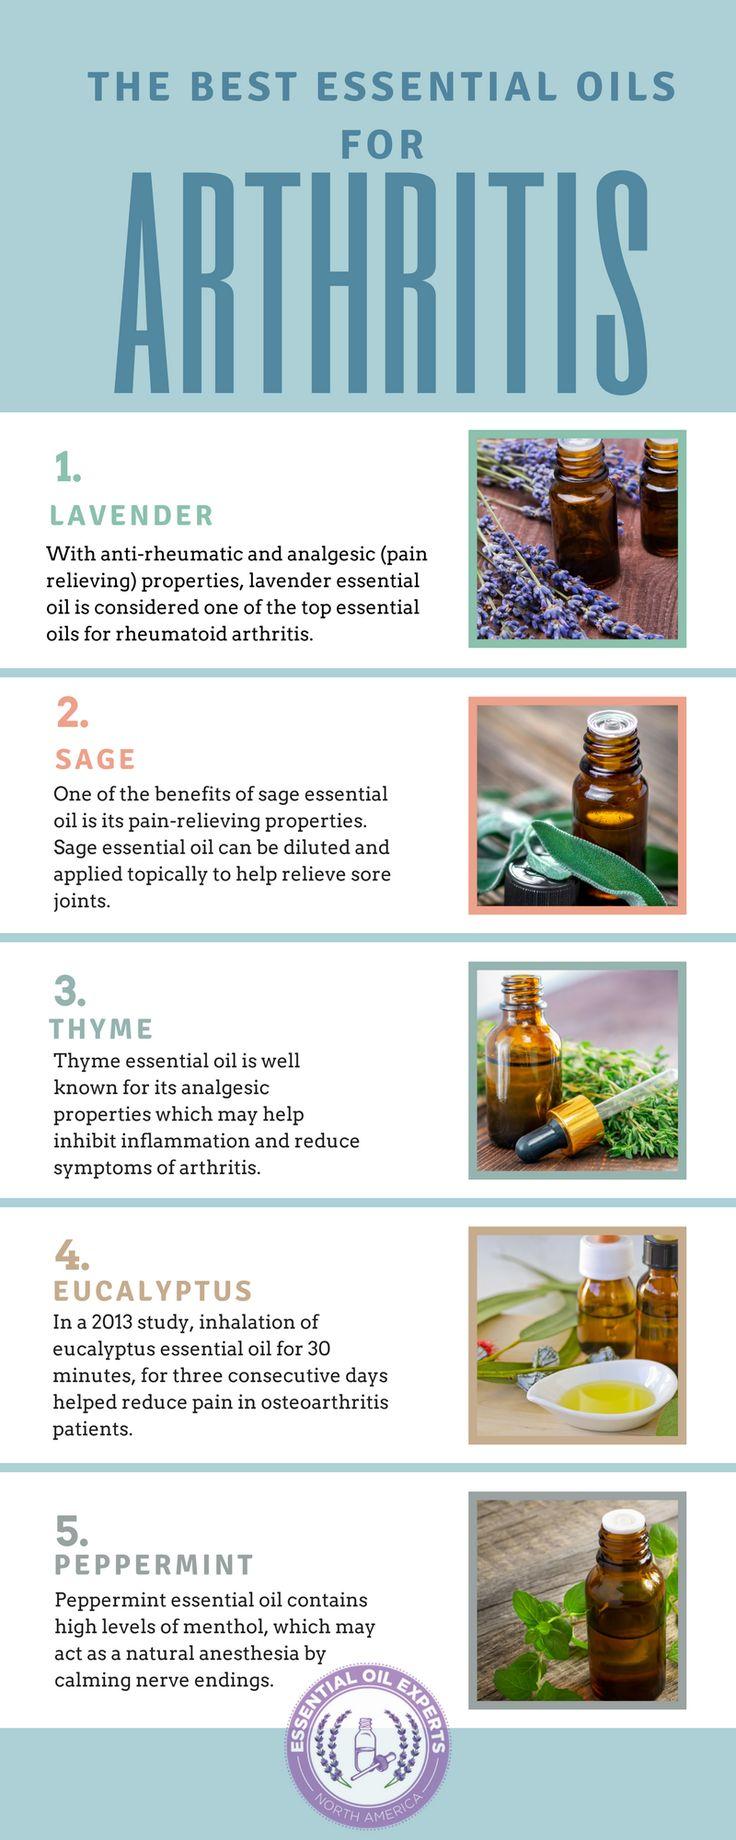 Best Essential Oils for Arthritis - Natural Remedies for Arthritis